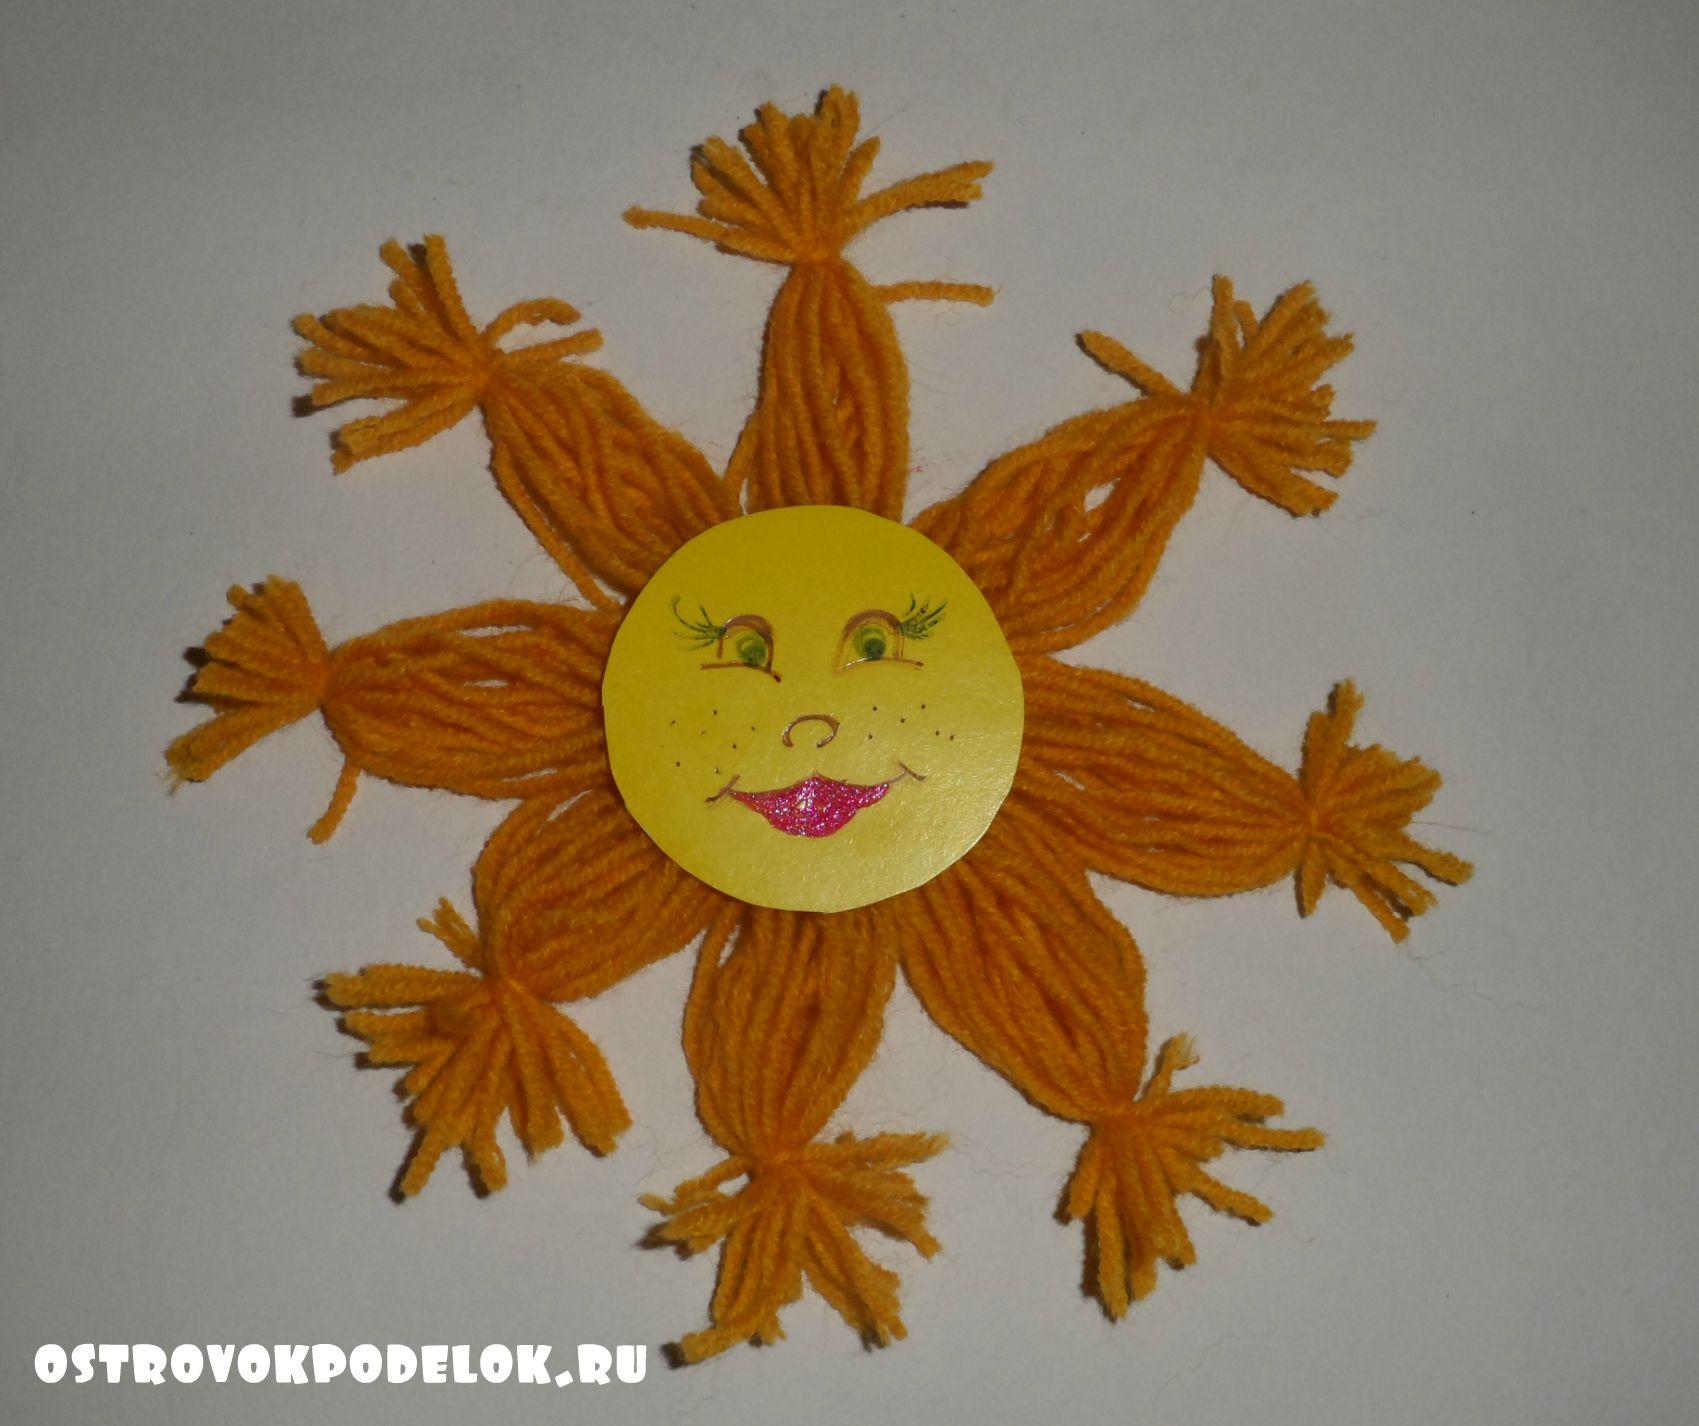 Поделка солнышко своими руками из ниток 86